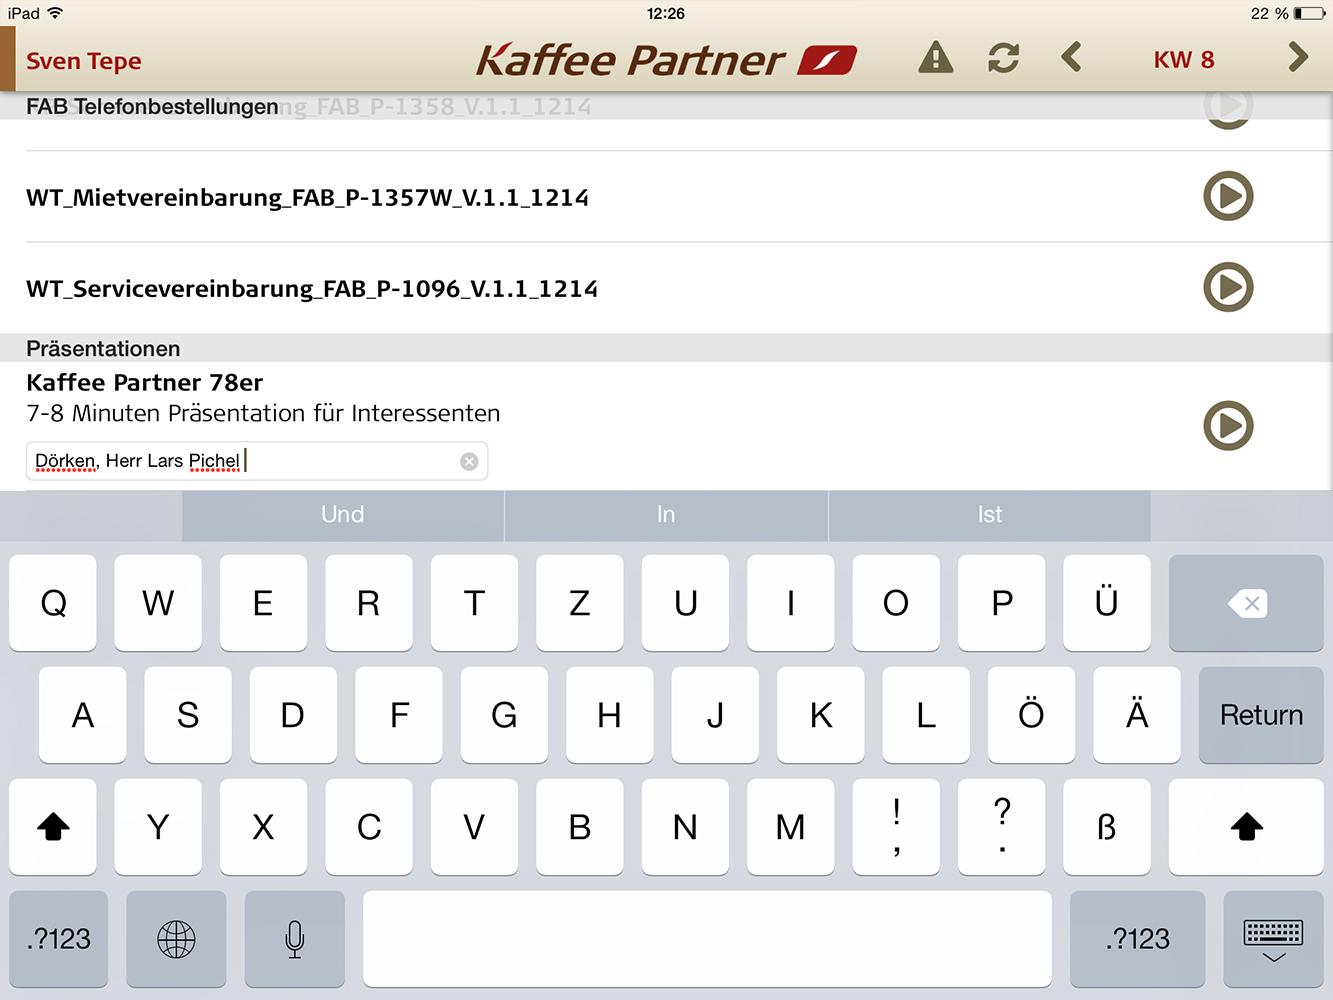 kaffeepartner_eingabe-individuelle-praesentation